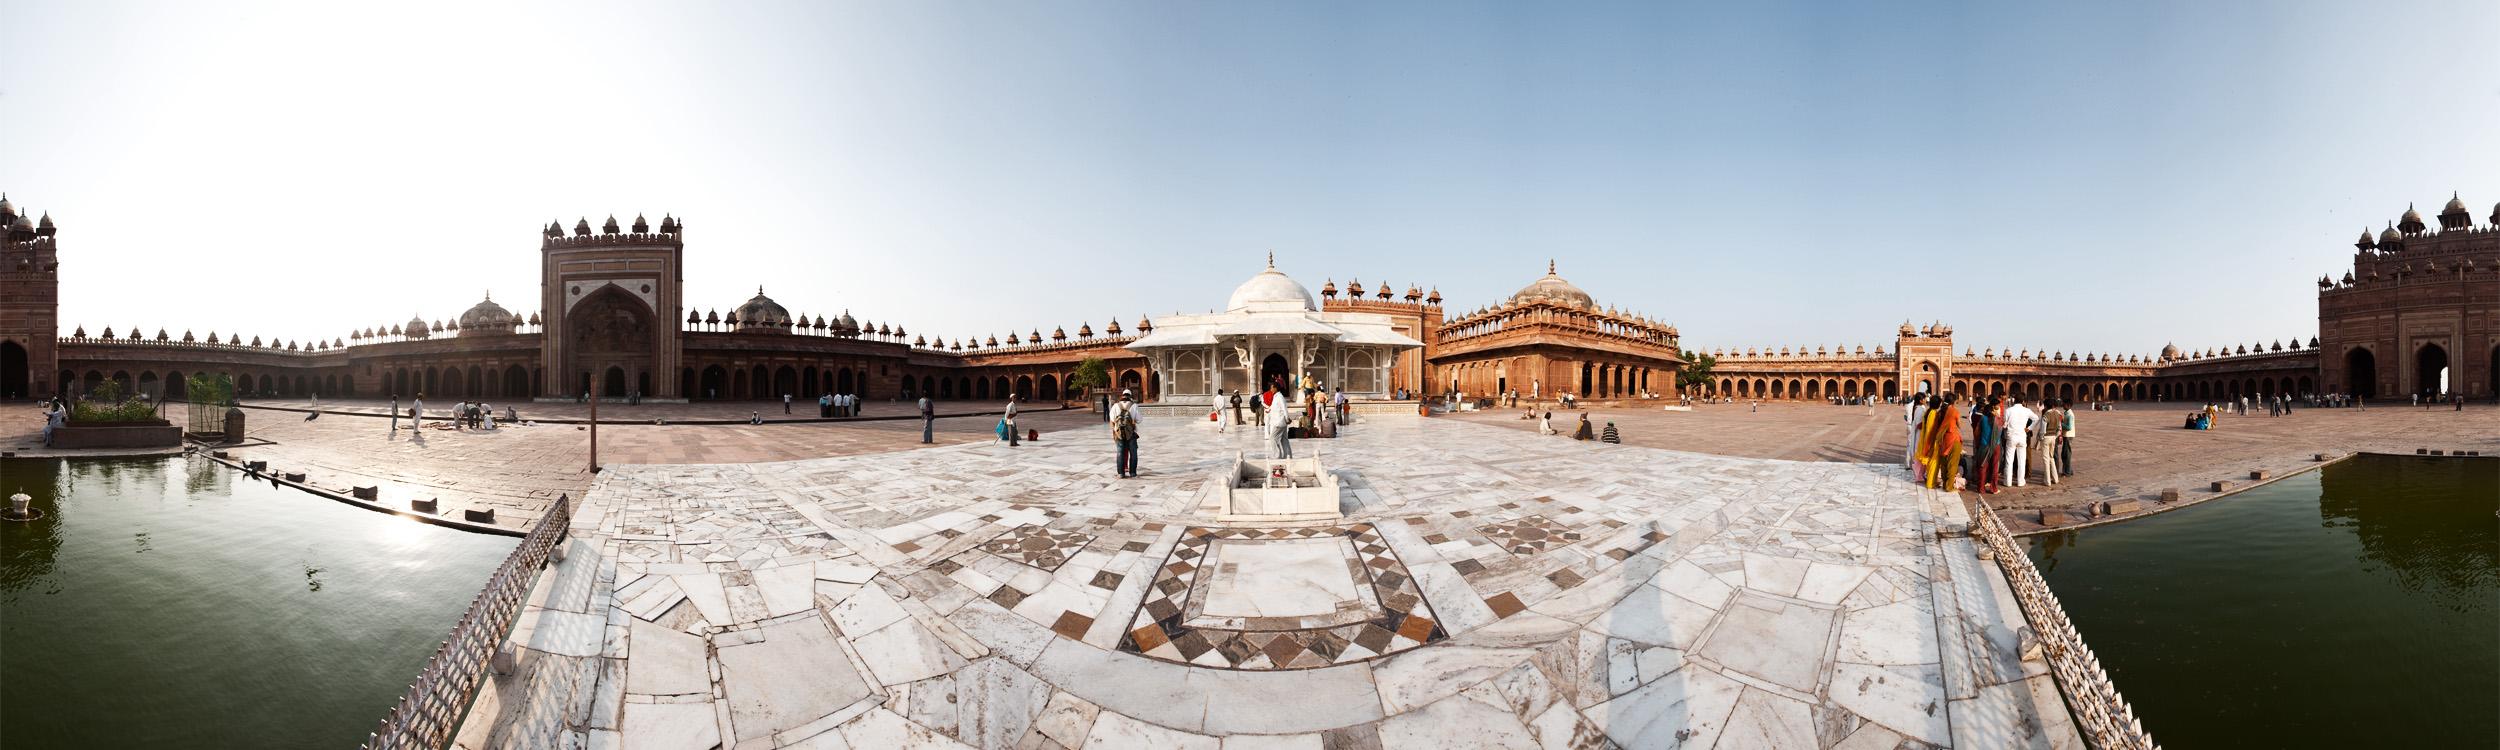 Panorama of Jama Masjid Courtyard. - Fatehpur Sikri, Uttar Pradesh, India - Daily Travel Photos